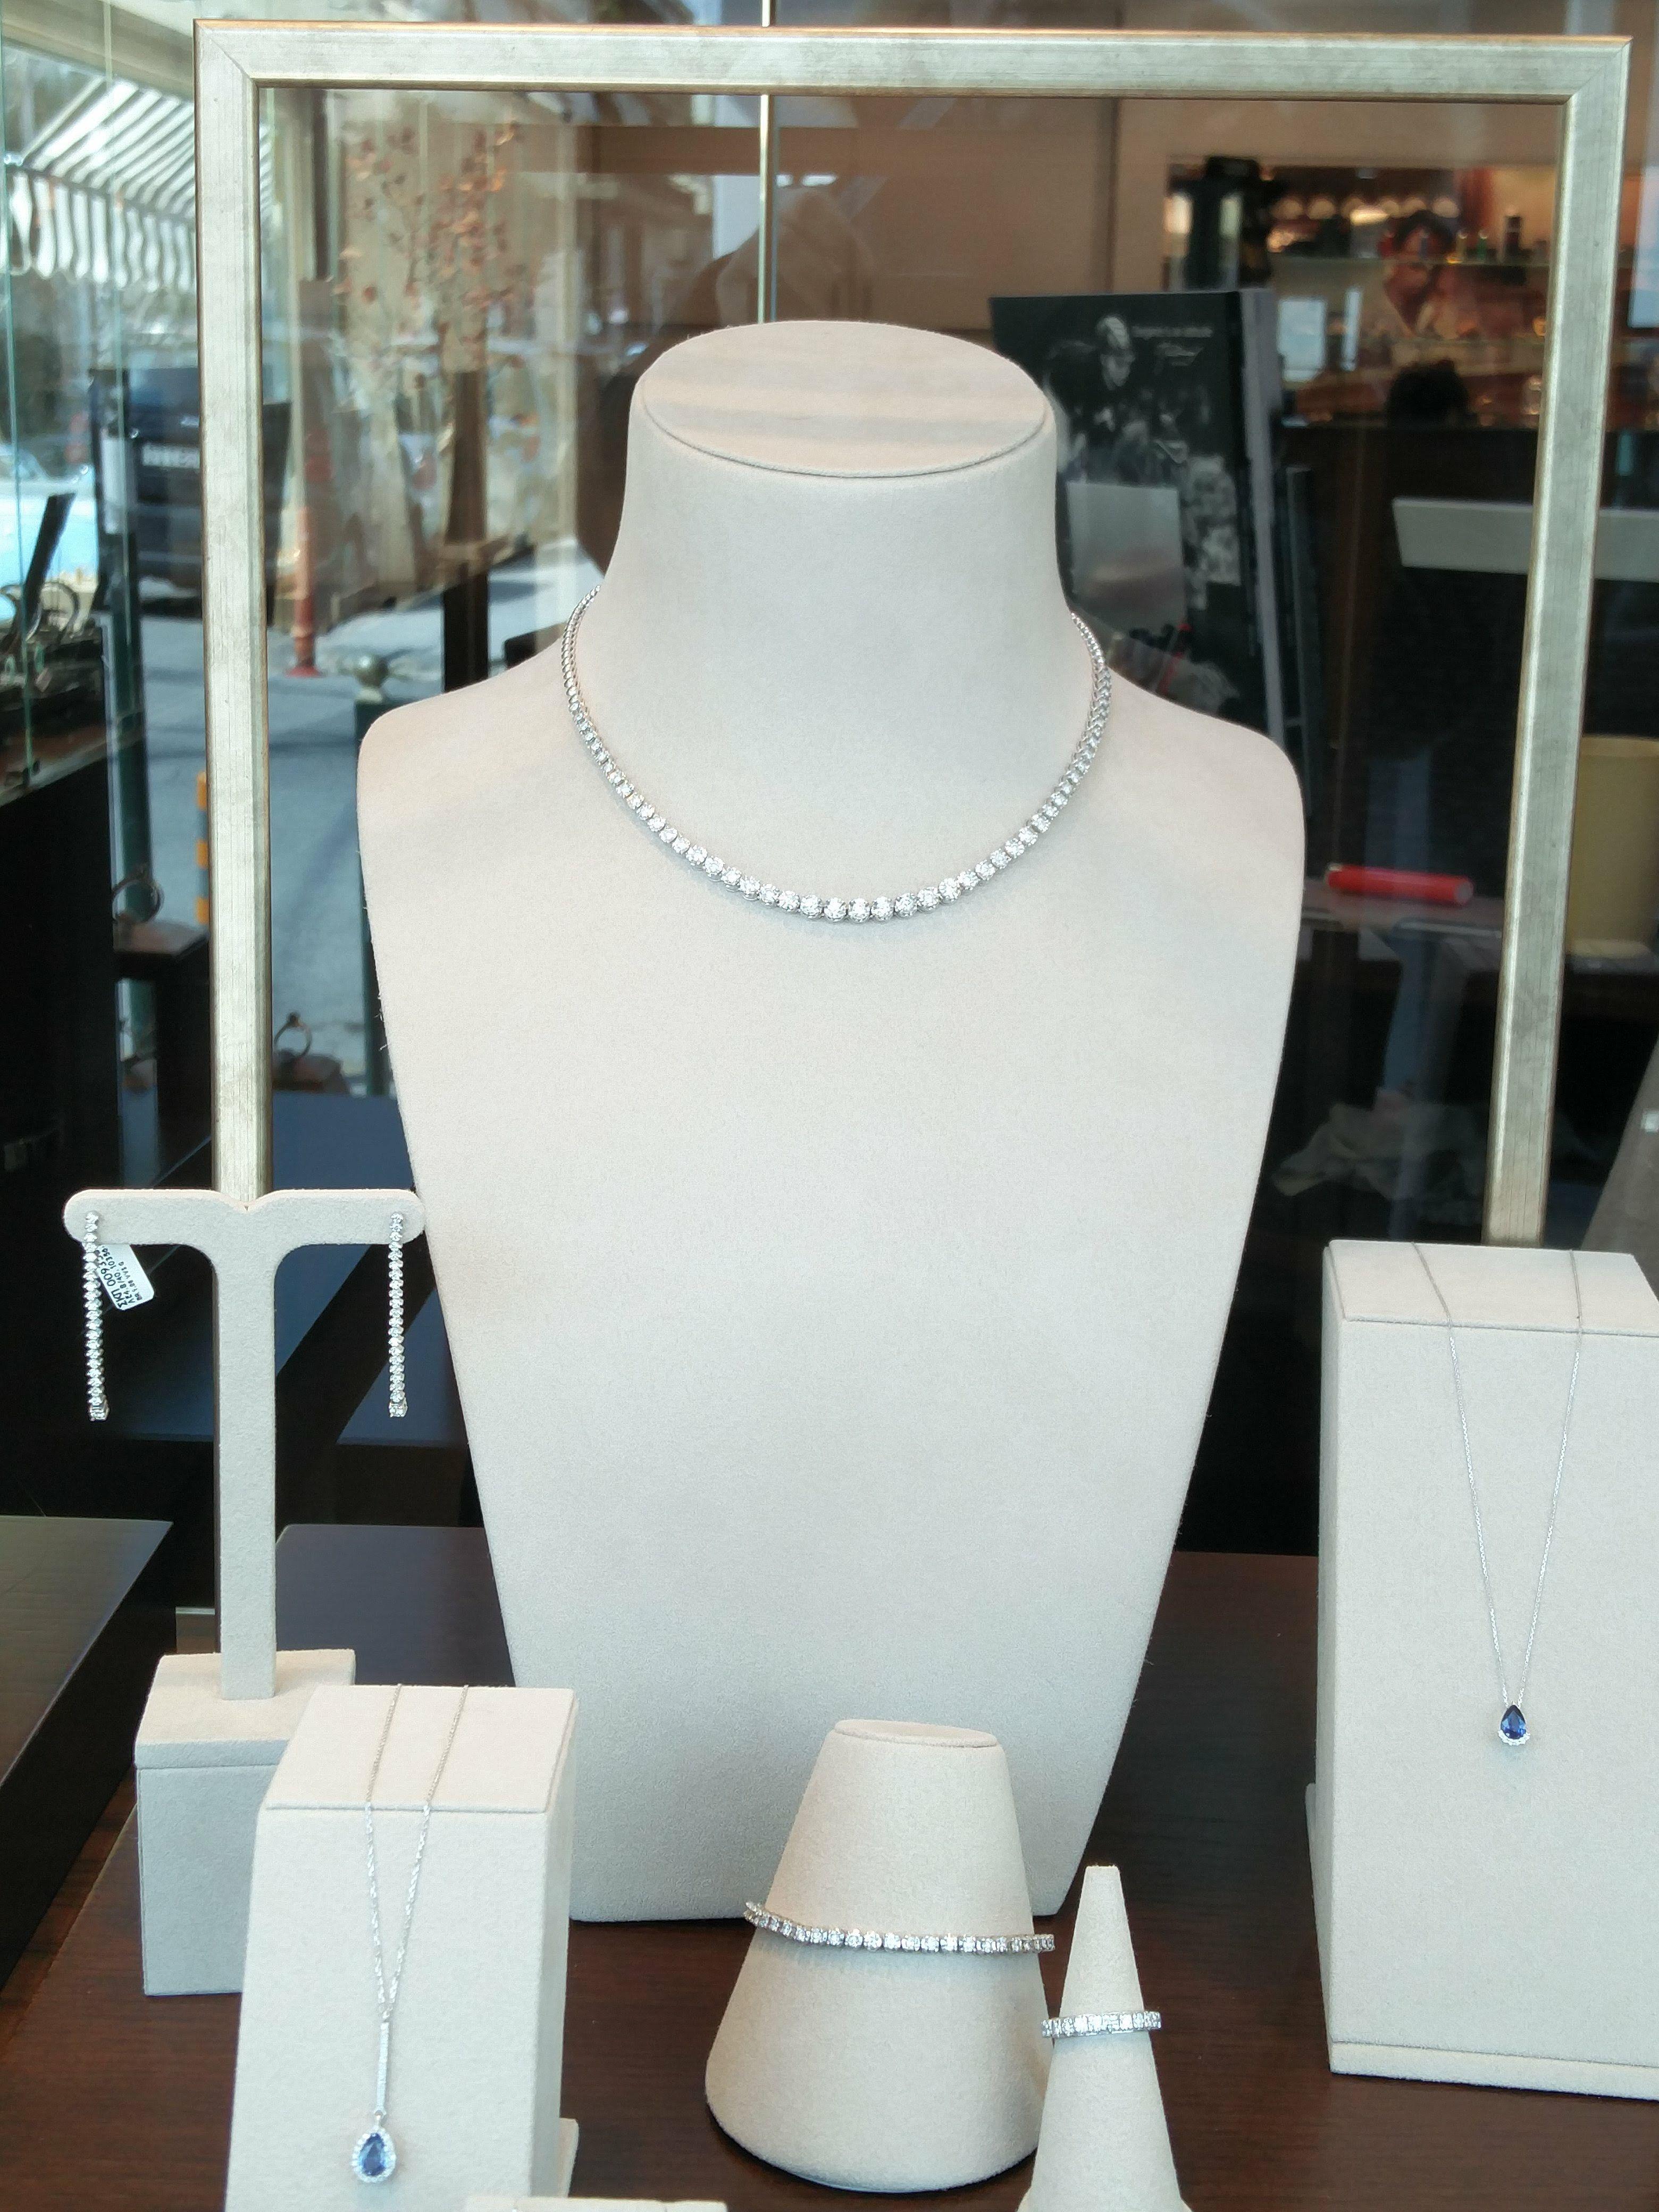 d83d3d1b1c Diamond necklace κολιέ ριβιέρα με διαμάντια ή μενταγιόν με ορυκτές πέτρες  http   tsaldaris